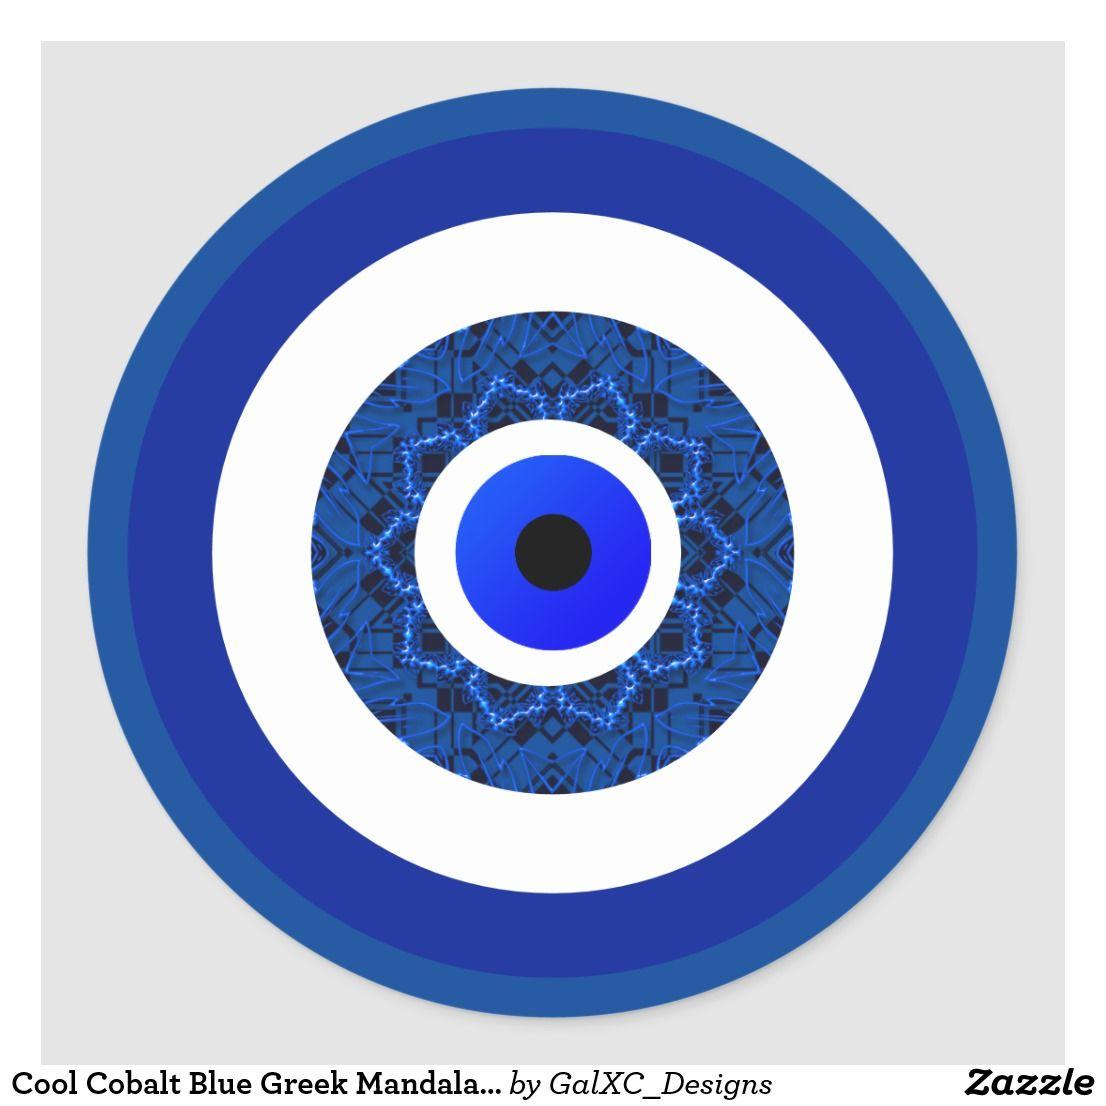 Cool Cobalt Blue Greek Mandala Nazar Evil Eye Classic Round Sticker Zazzle Com Round Stickers Mandala Deeper Shade Of Blue